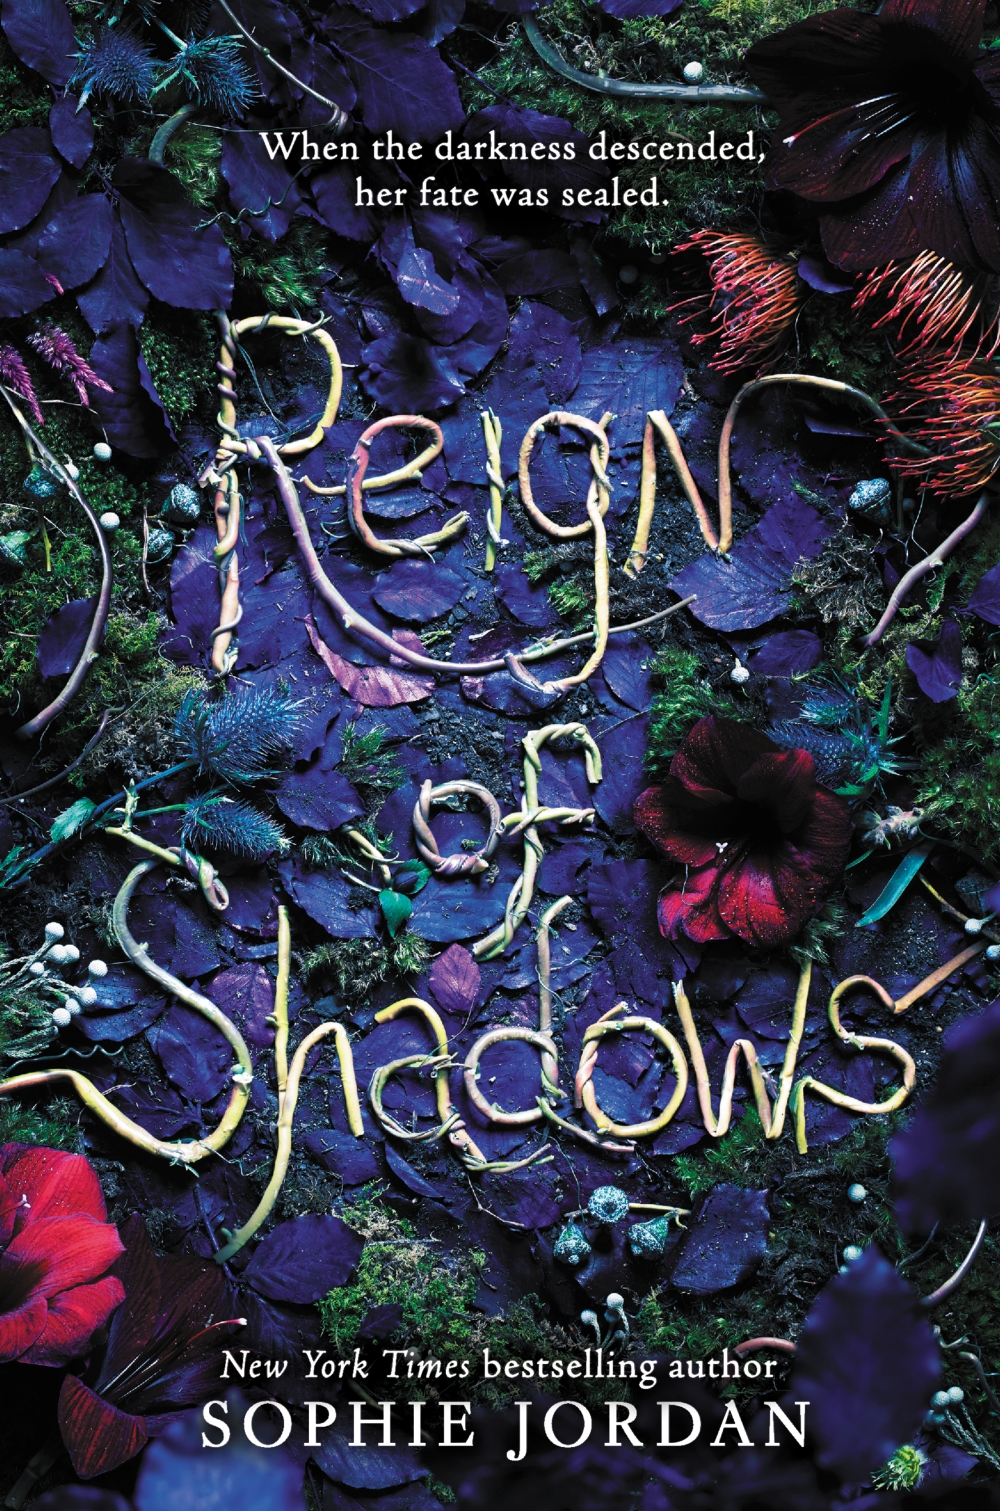 ReignofShadows_cvr